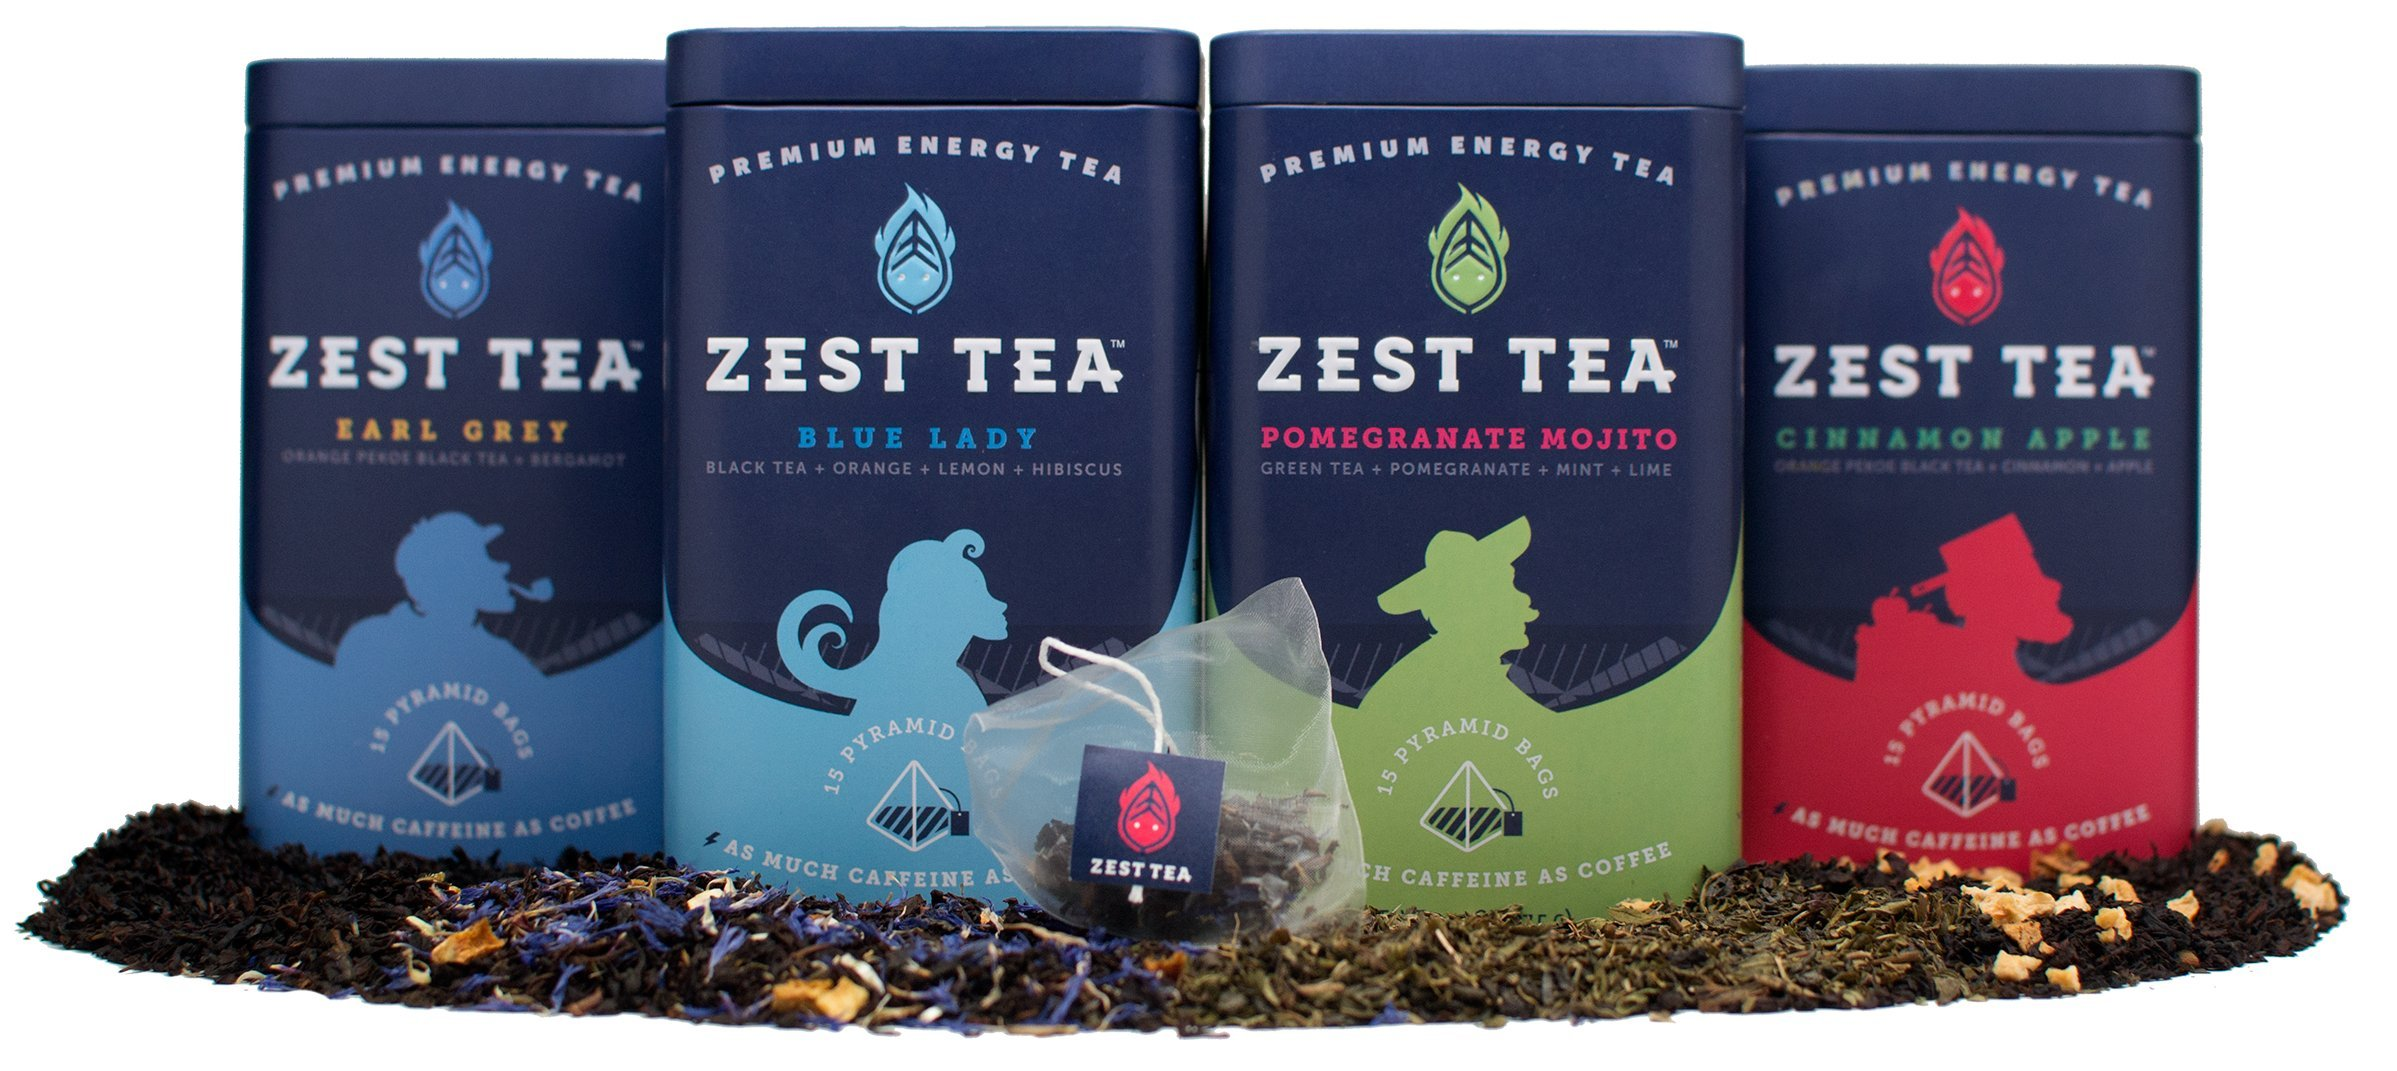 Zest Tea Premium Energy Hot Tea Sampler Kit, High Caffeine Blend Natural & Healthy Coffee Substitute, Perfect for Keto, Apple Cinnamon, Blue Lady, Earl Grey, Pomegranate Mojito, 60 Sachet Bags by Zest Tea